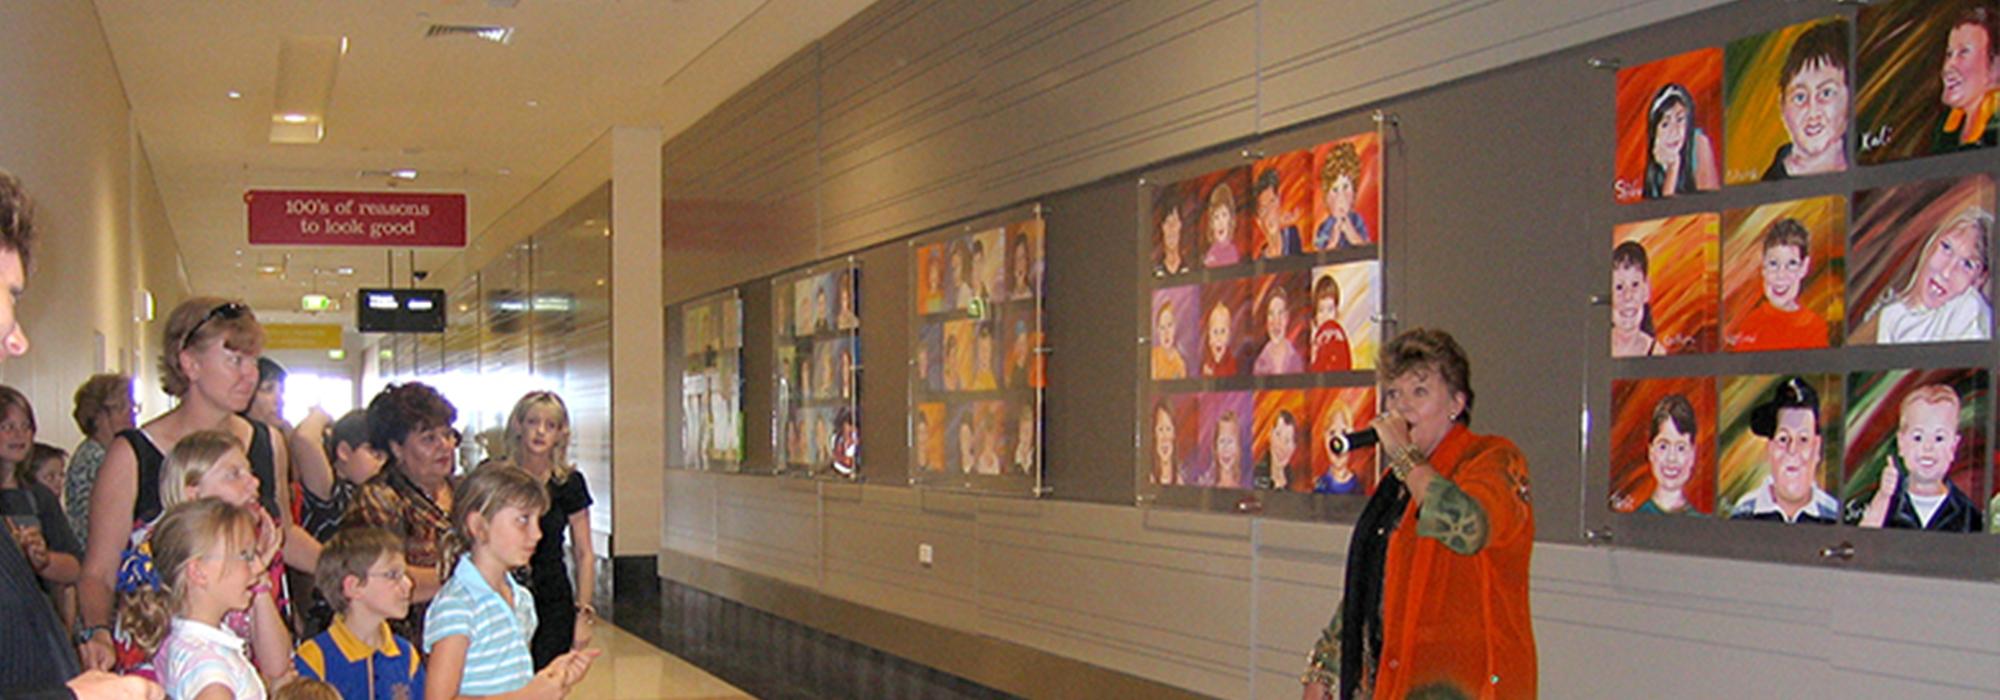 Banner-faces-of-westfield--children-shopping-art-by-Sharron-Tancred-@-TailoredArtworks